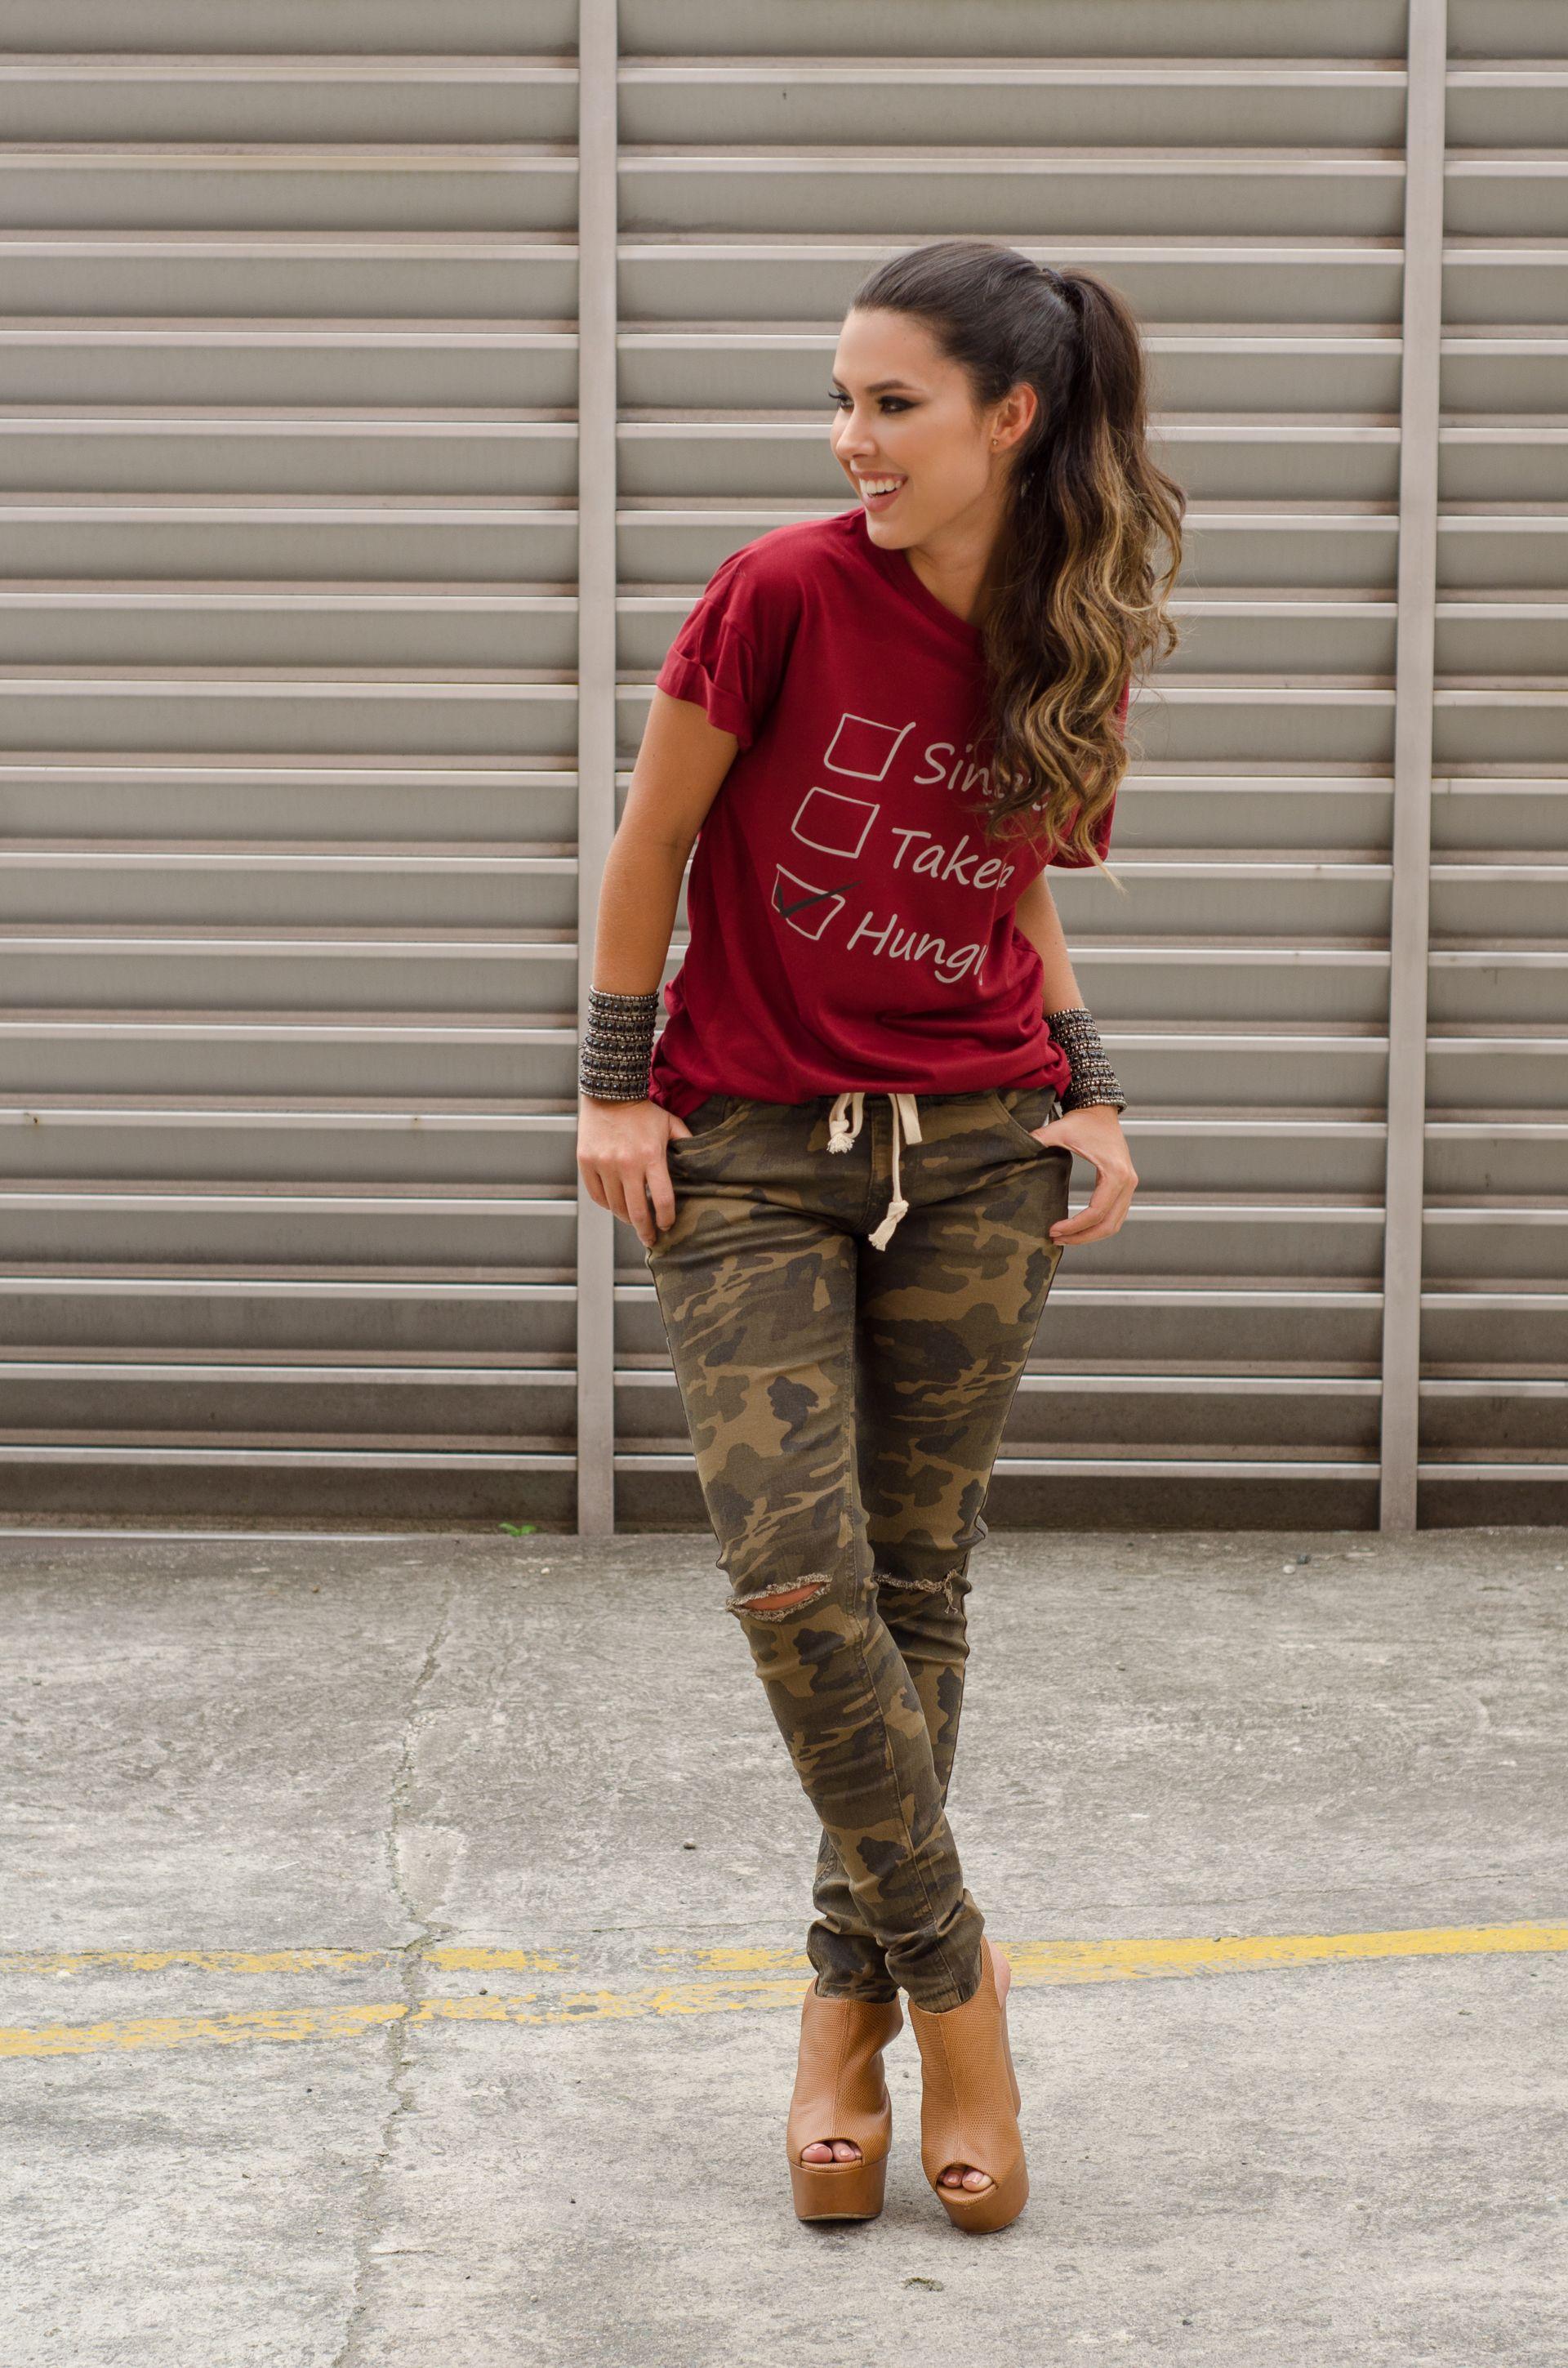 T-shirts nnocence Cloth Bracelet Pants Army Camiseta Brazalete Camiseta  Brazalete Pantalón Militar d4e23dd0735d